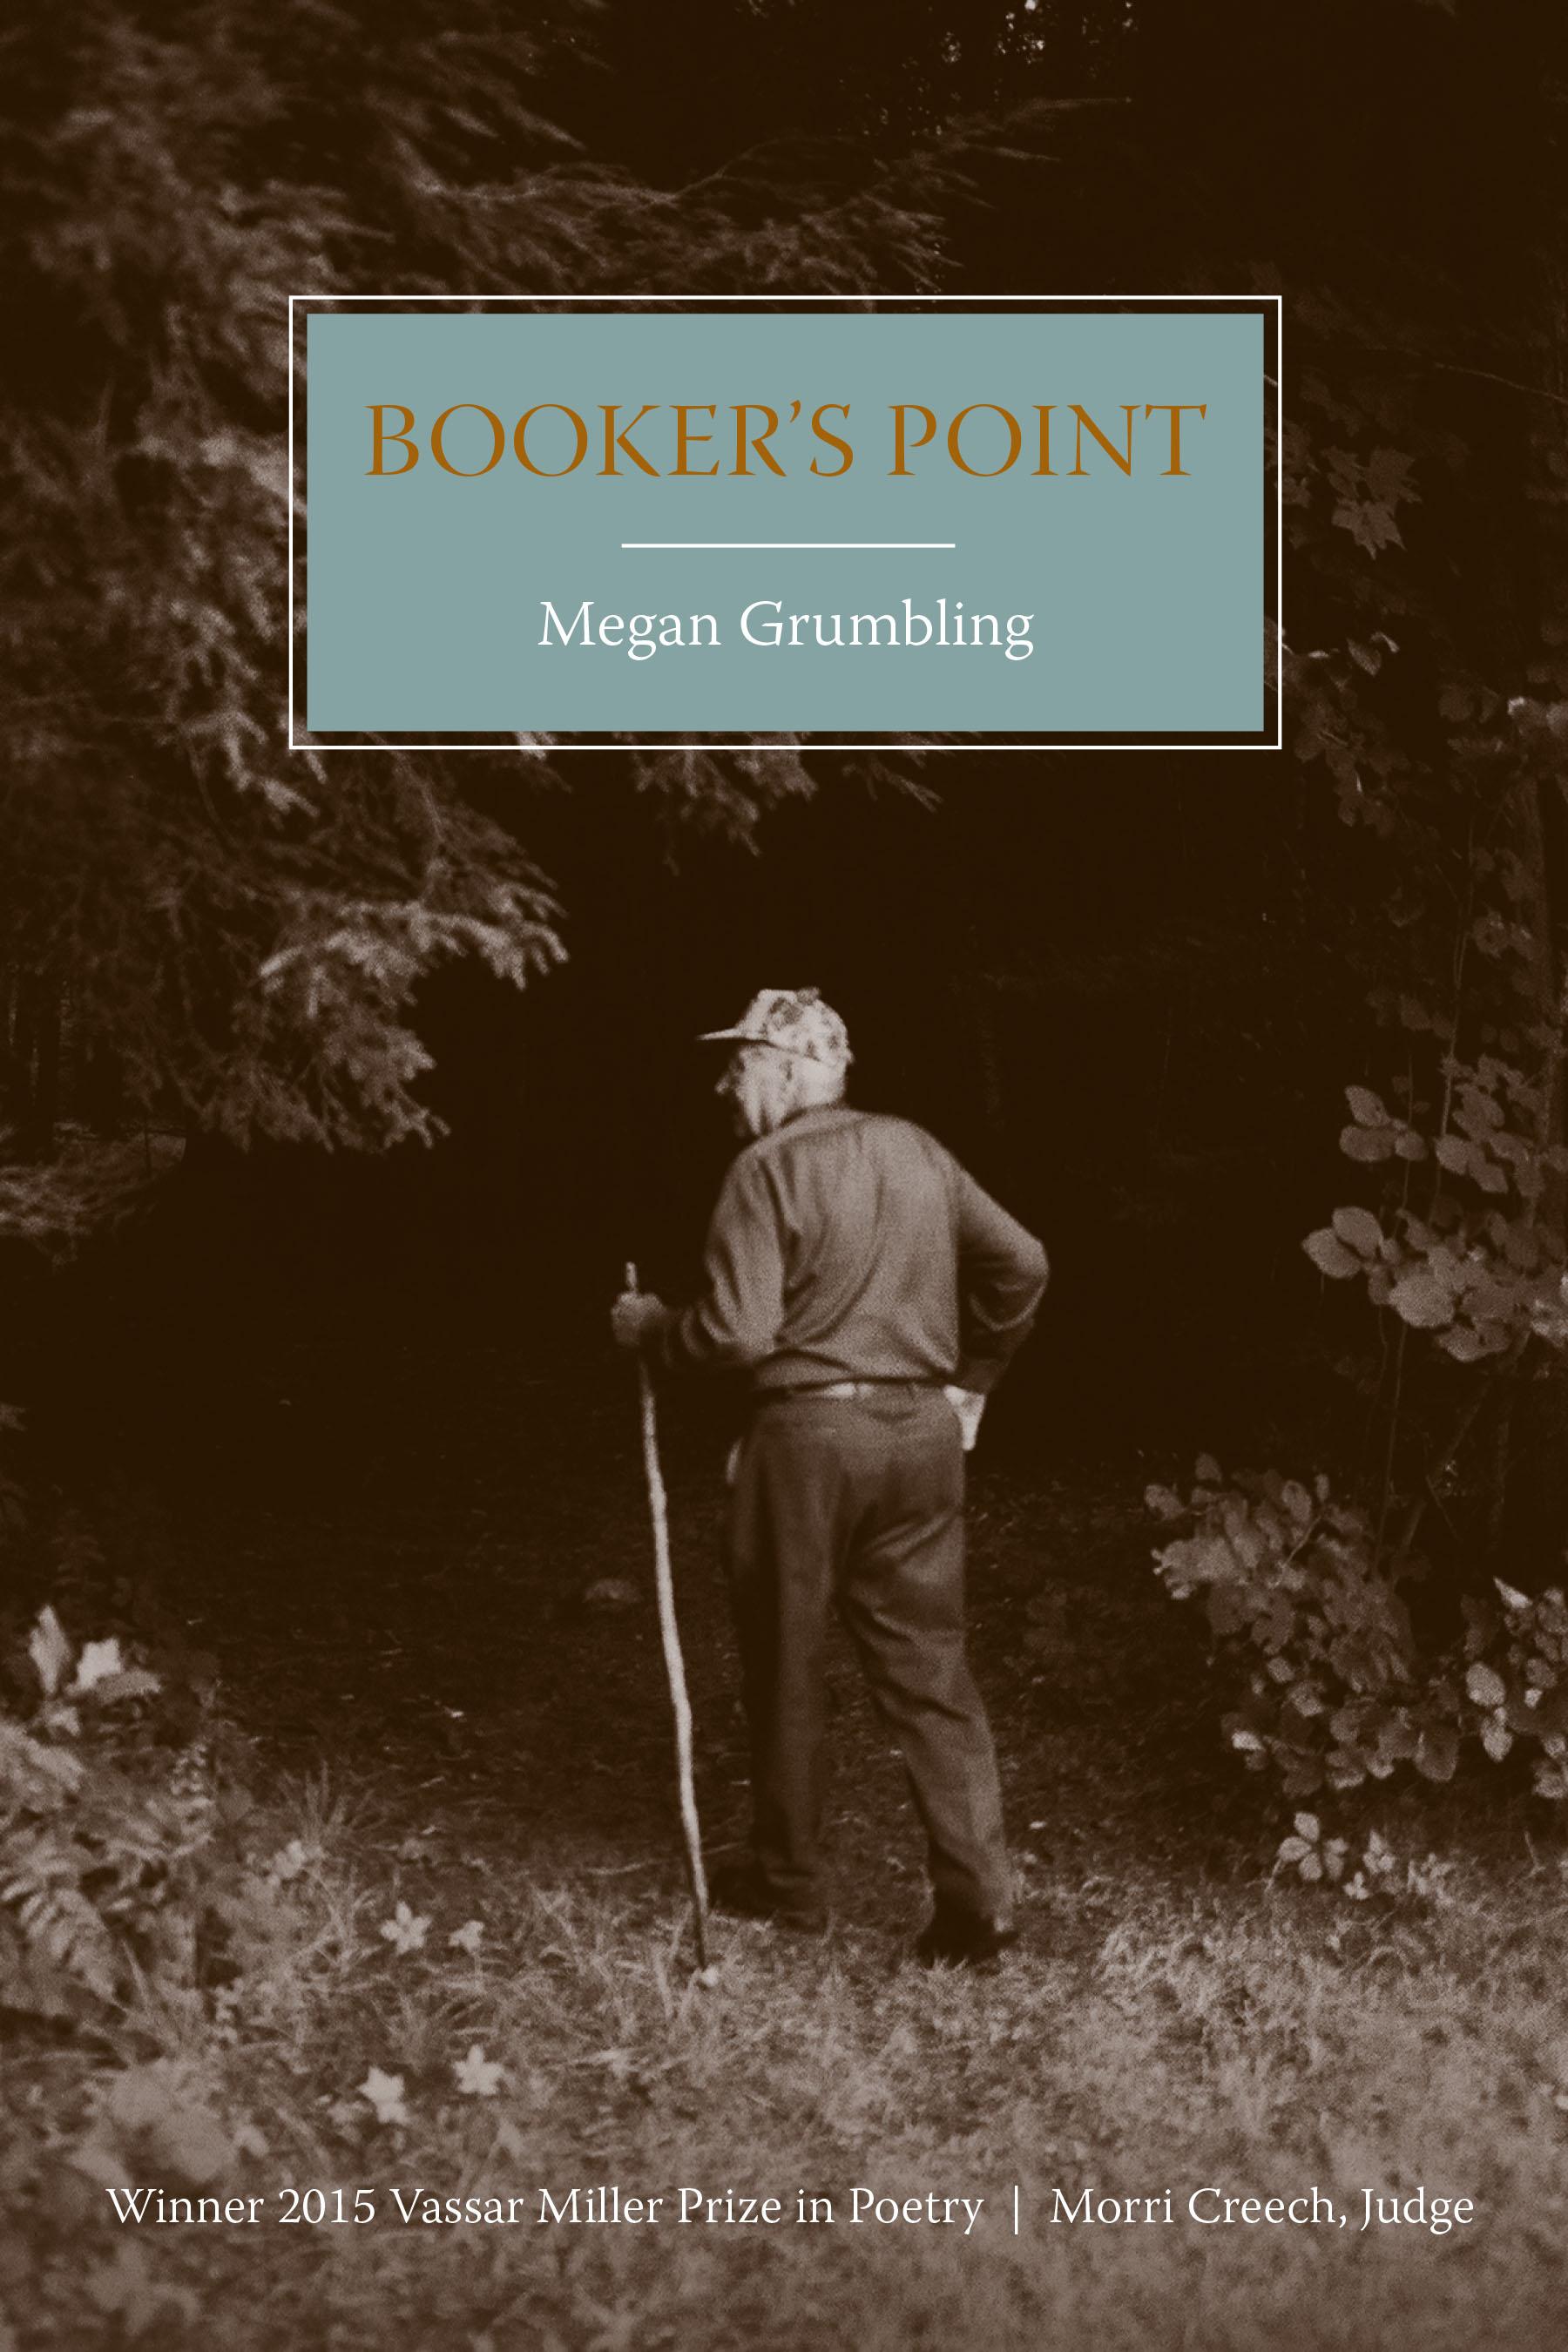 Grumbling Book Covers V4-2.jpg